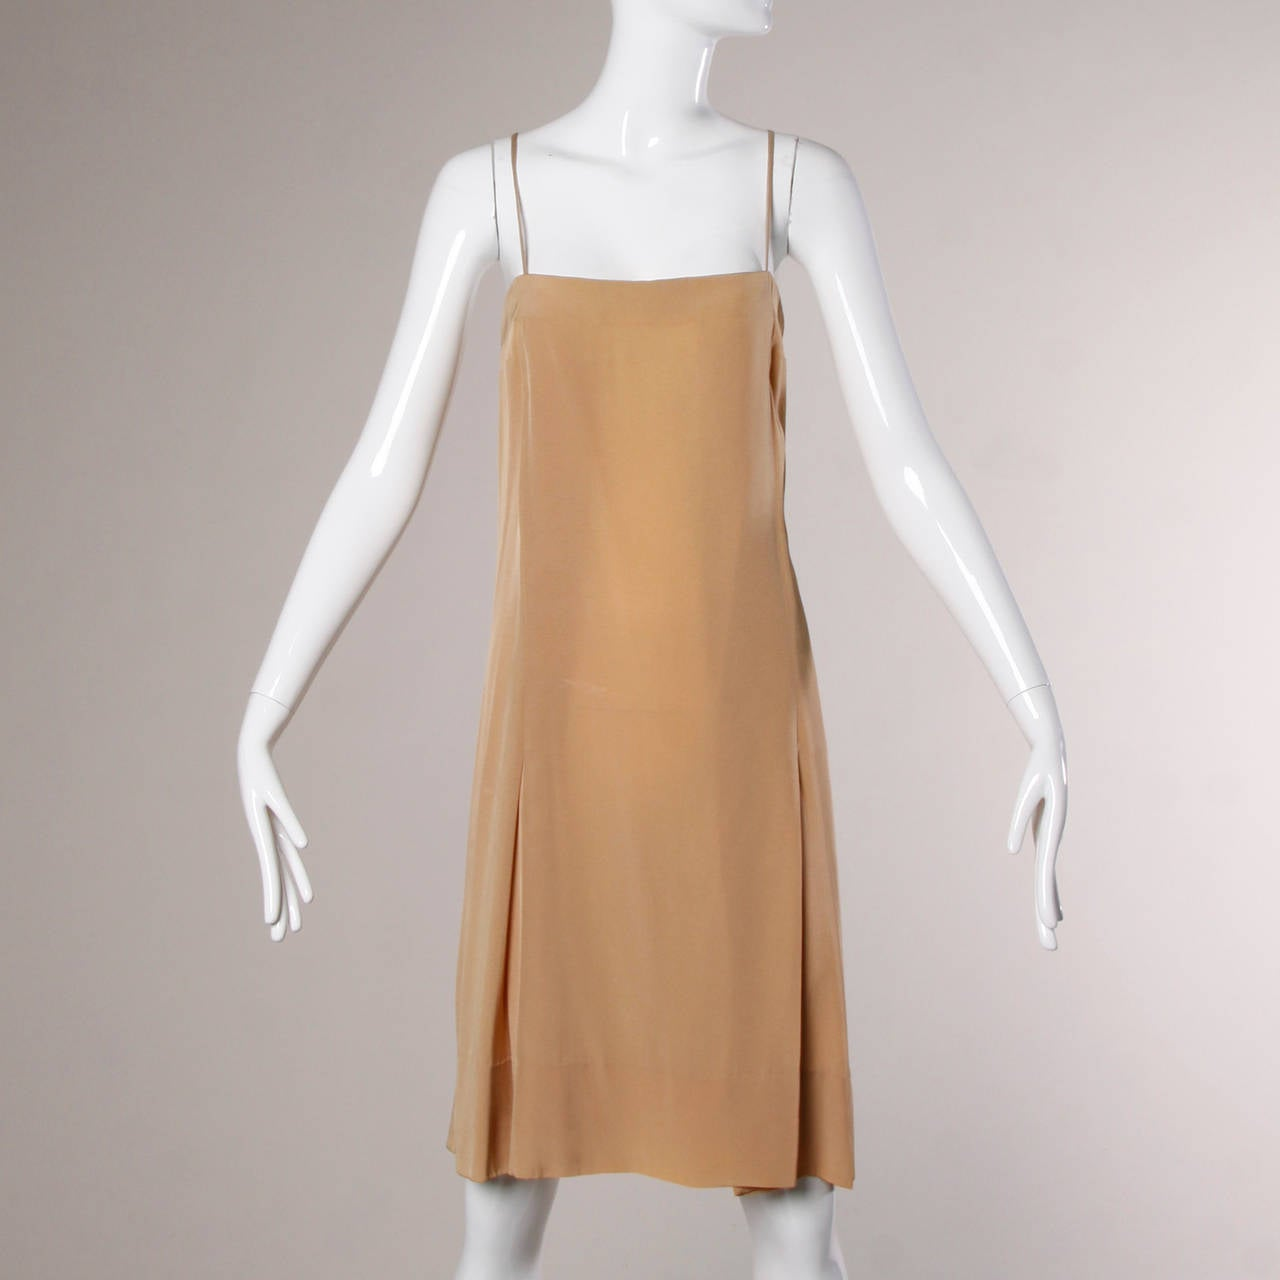 Pauline Trigere Vintage 1970s Metallic Silk 3-Piece Dress + Sash For Sale 3